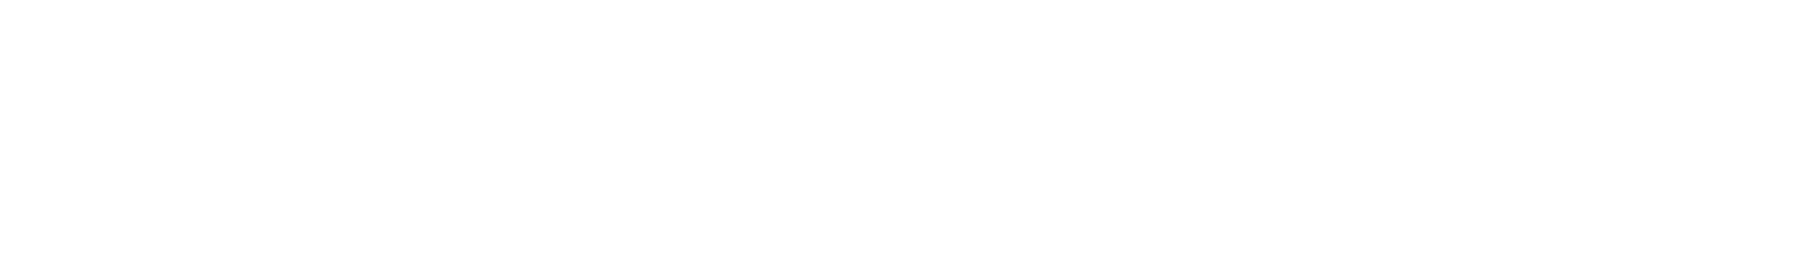 vedh melodyloop 048 bm g em 124bpm